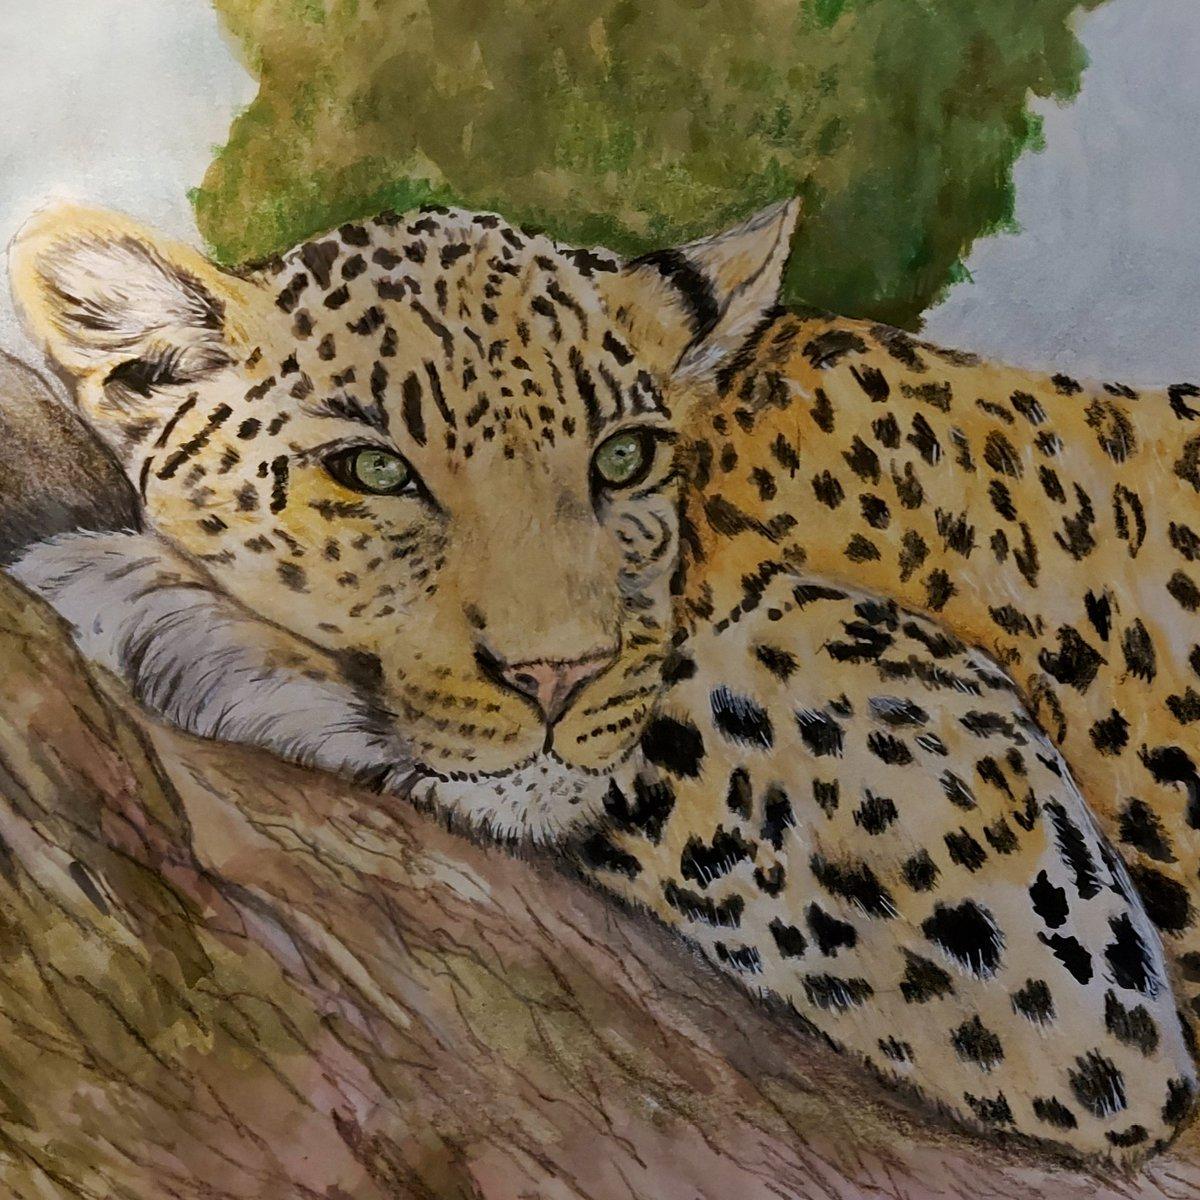 Leopard in a tree #leopard #wildlifeart #artist pic.twitter.com/AFBQhu9Psa